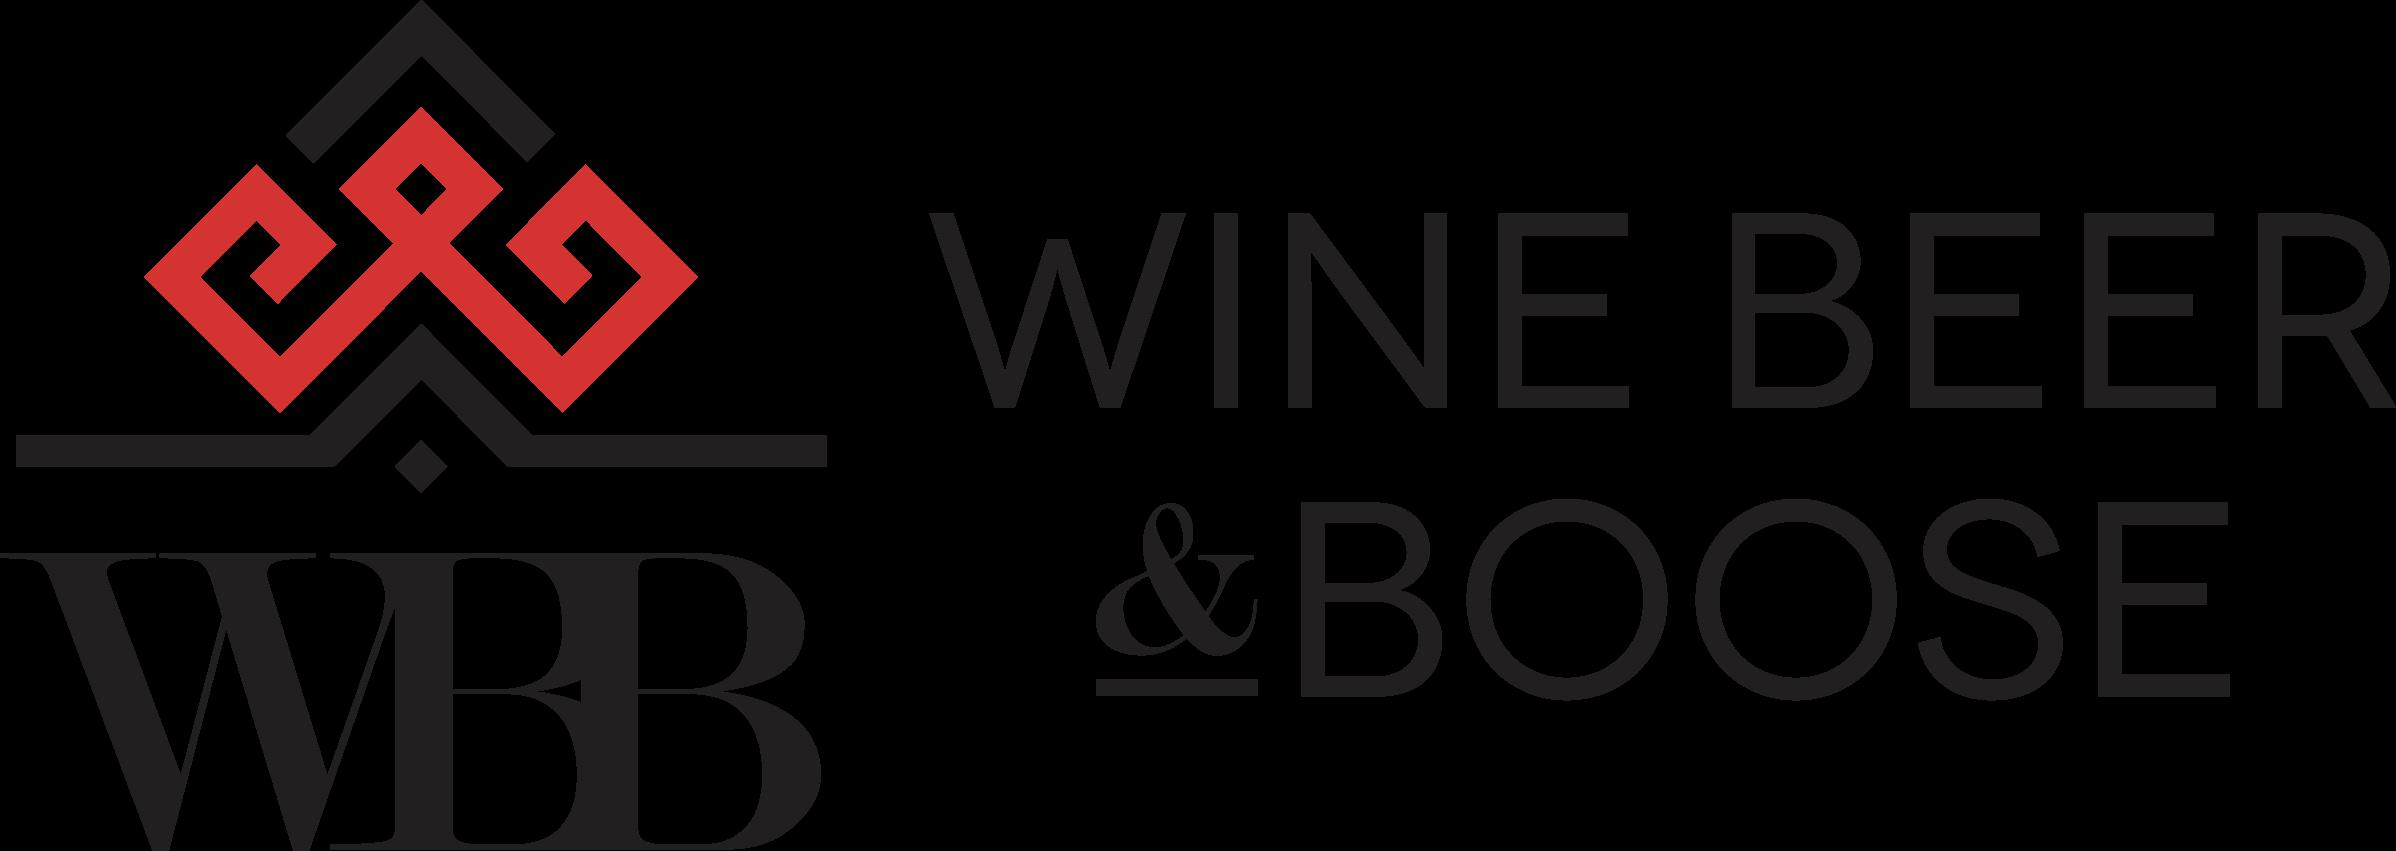 Store WBB Wine Beer Boose